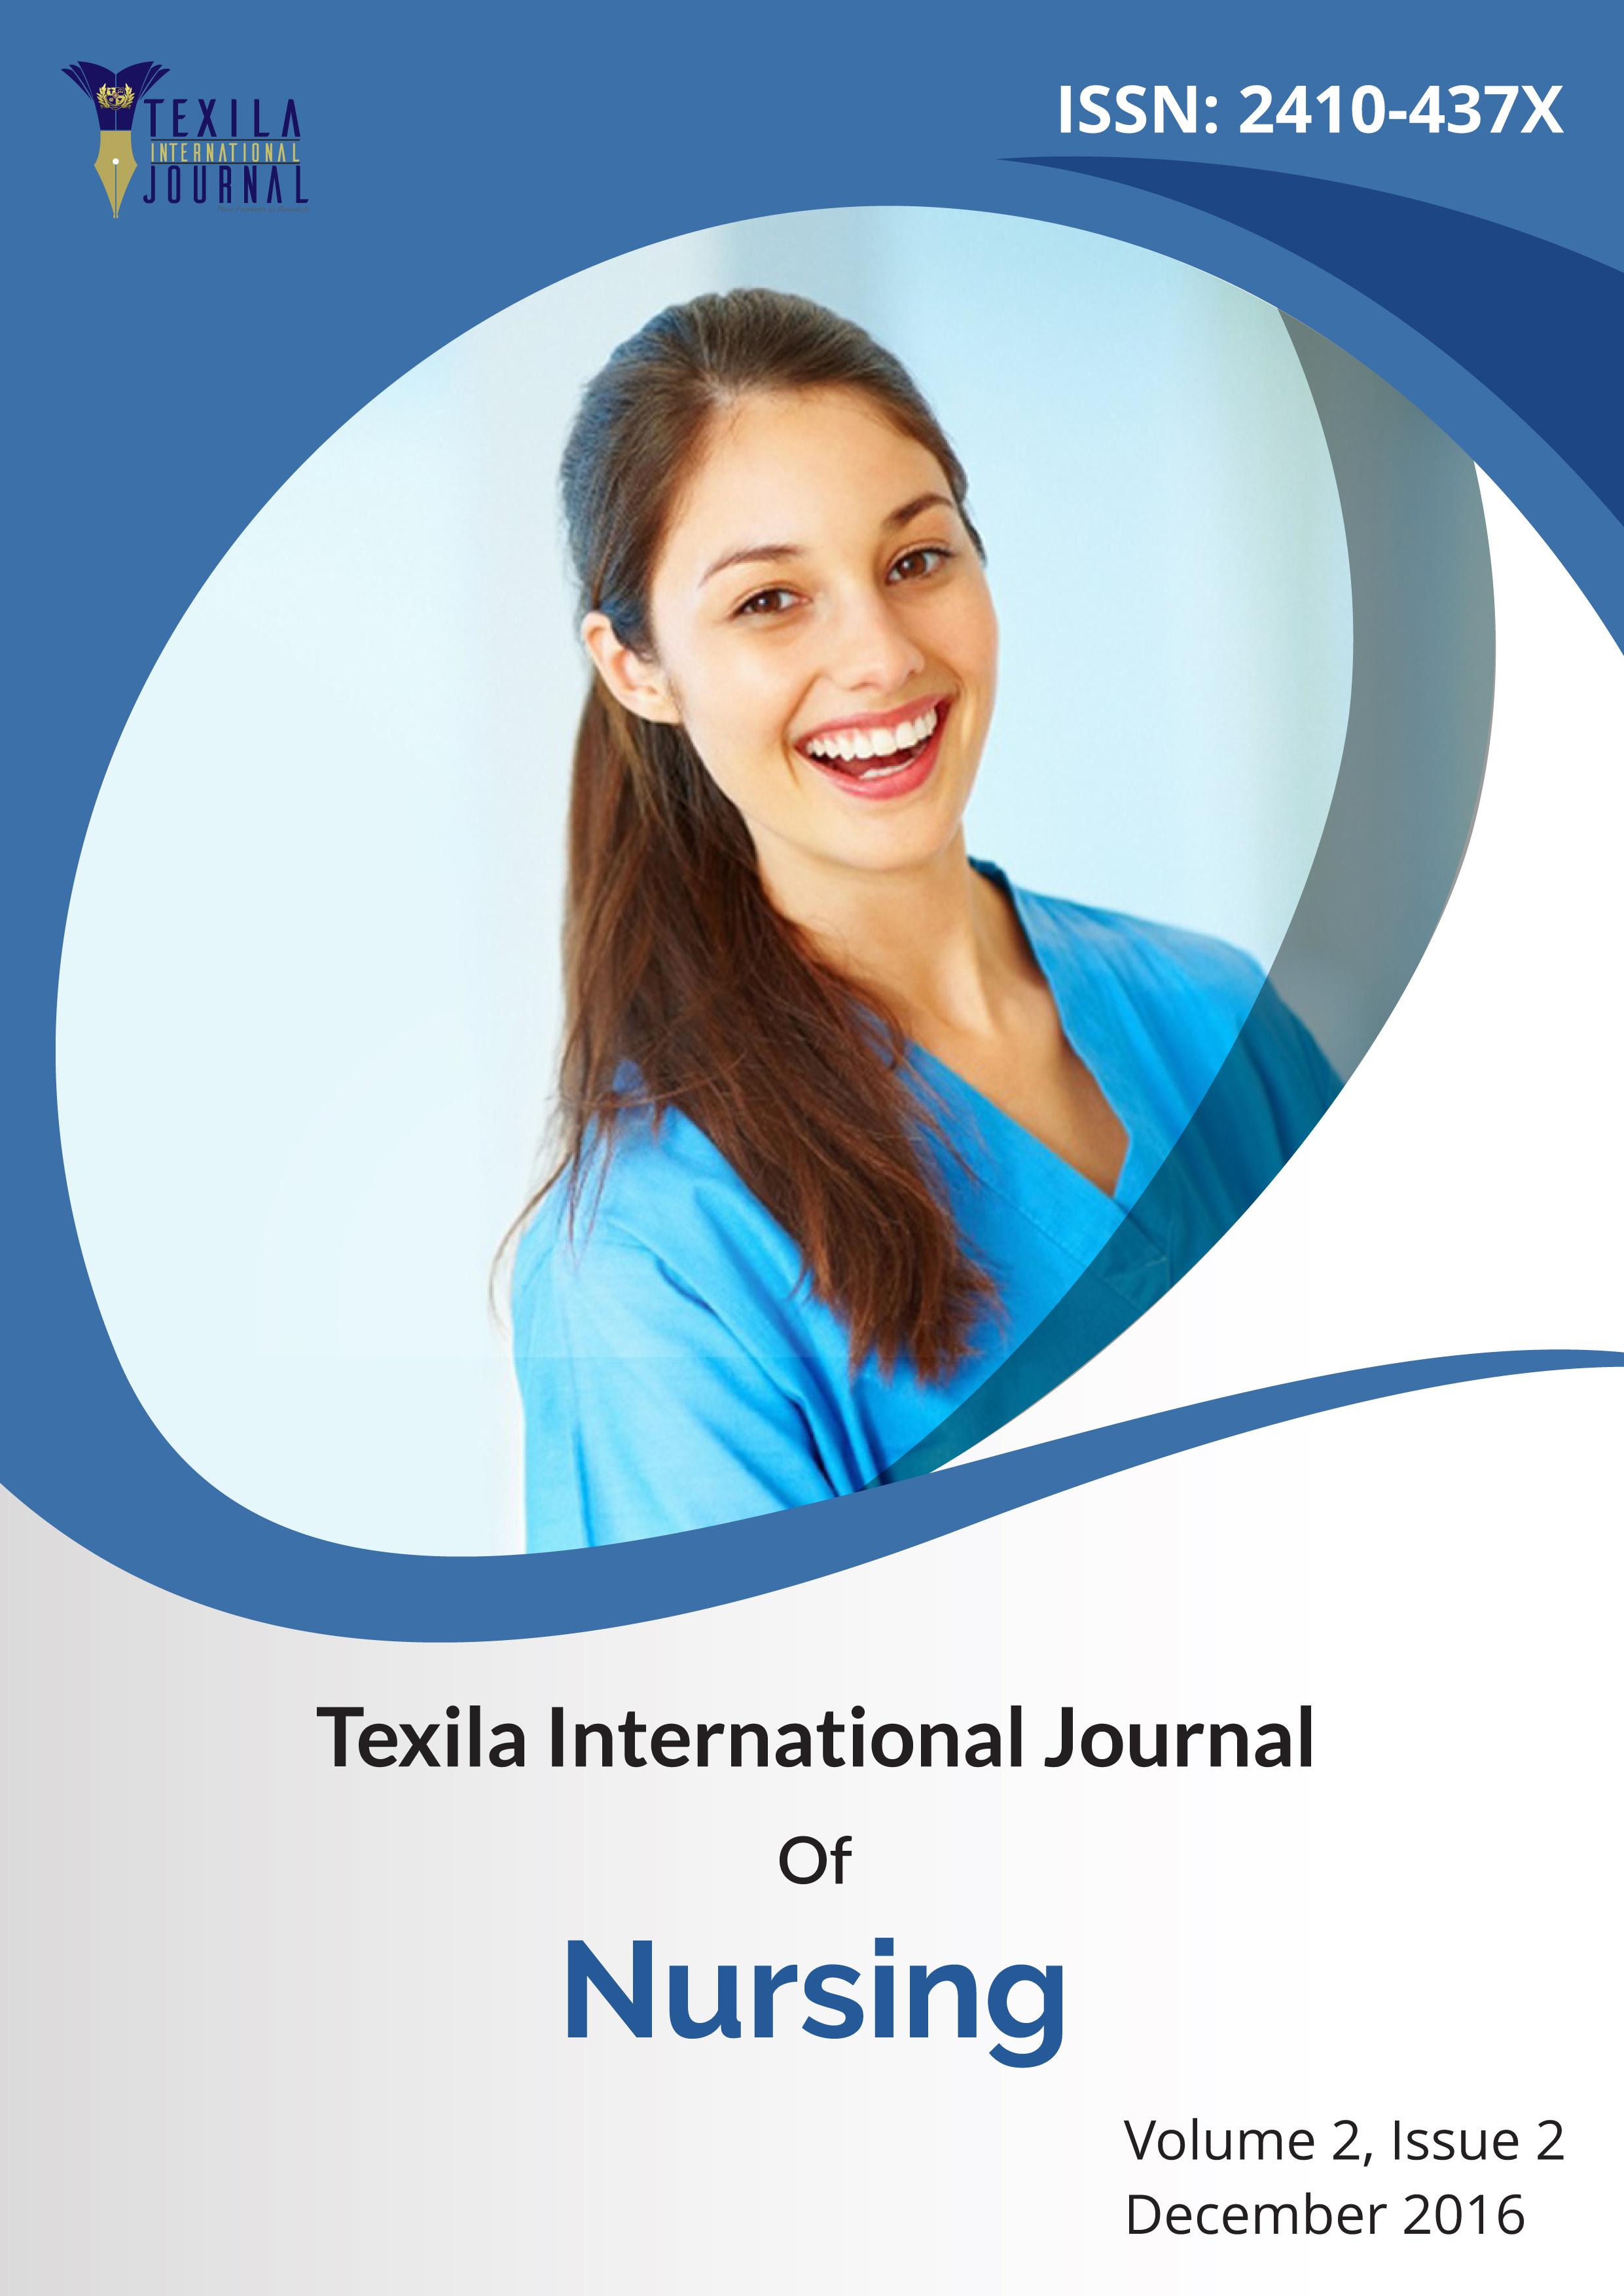 International journal of nursing|Texila Journal